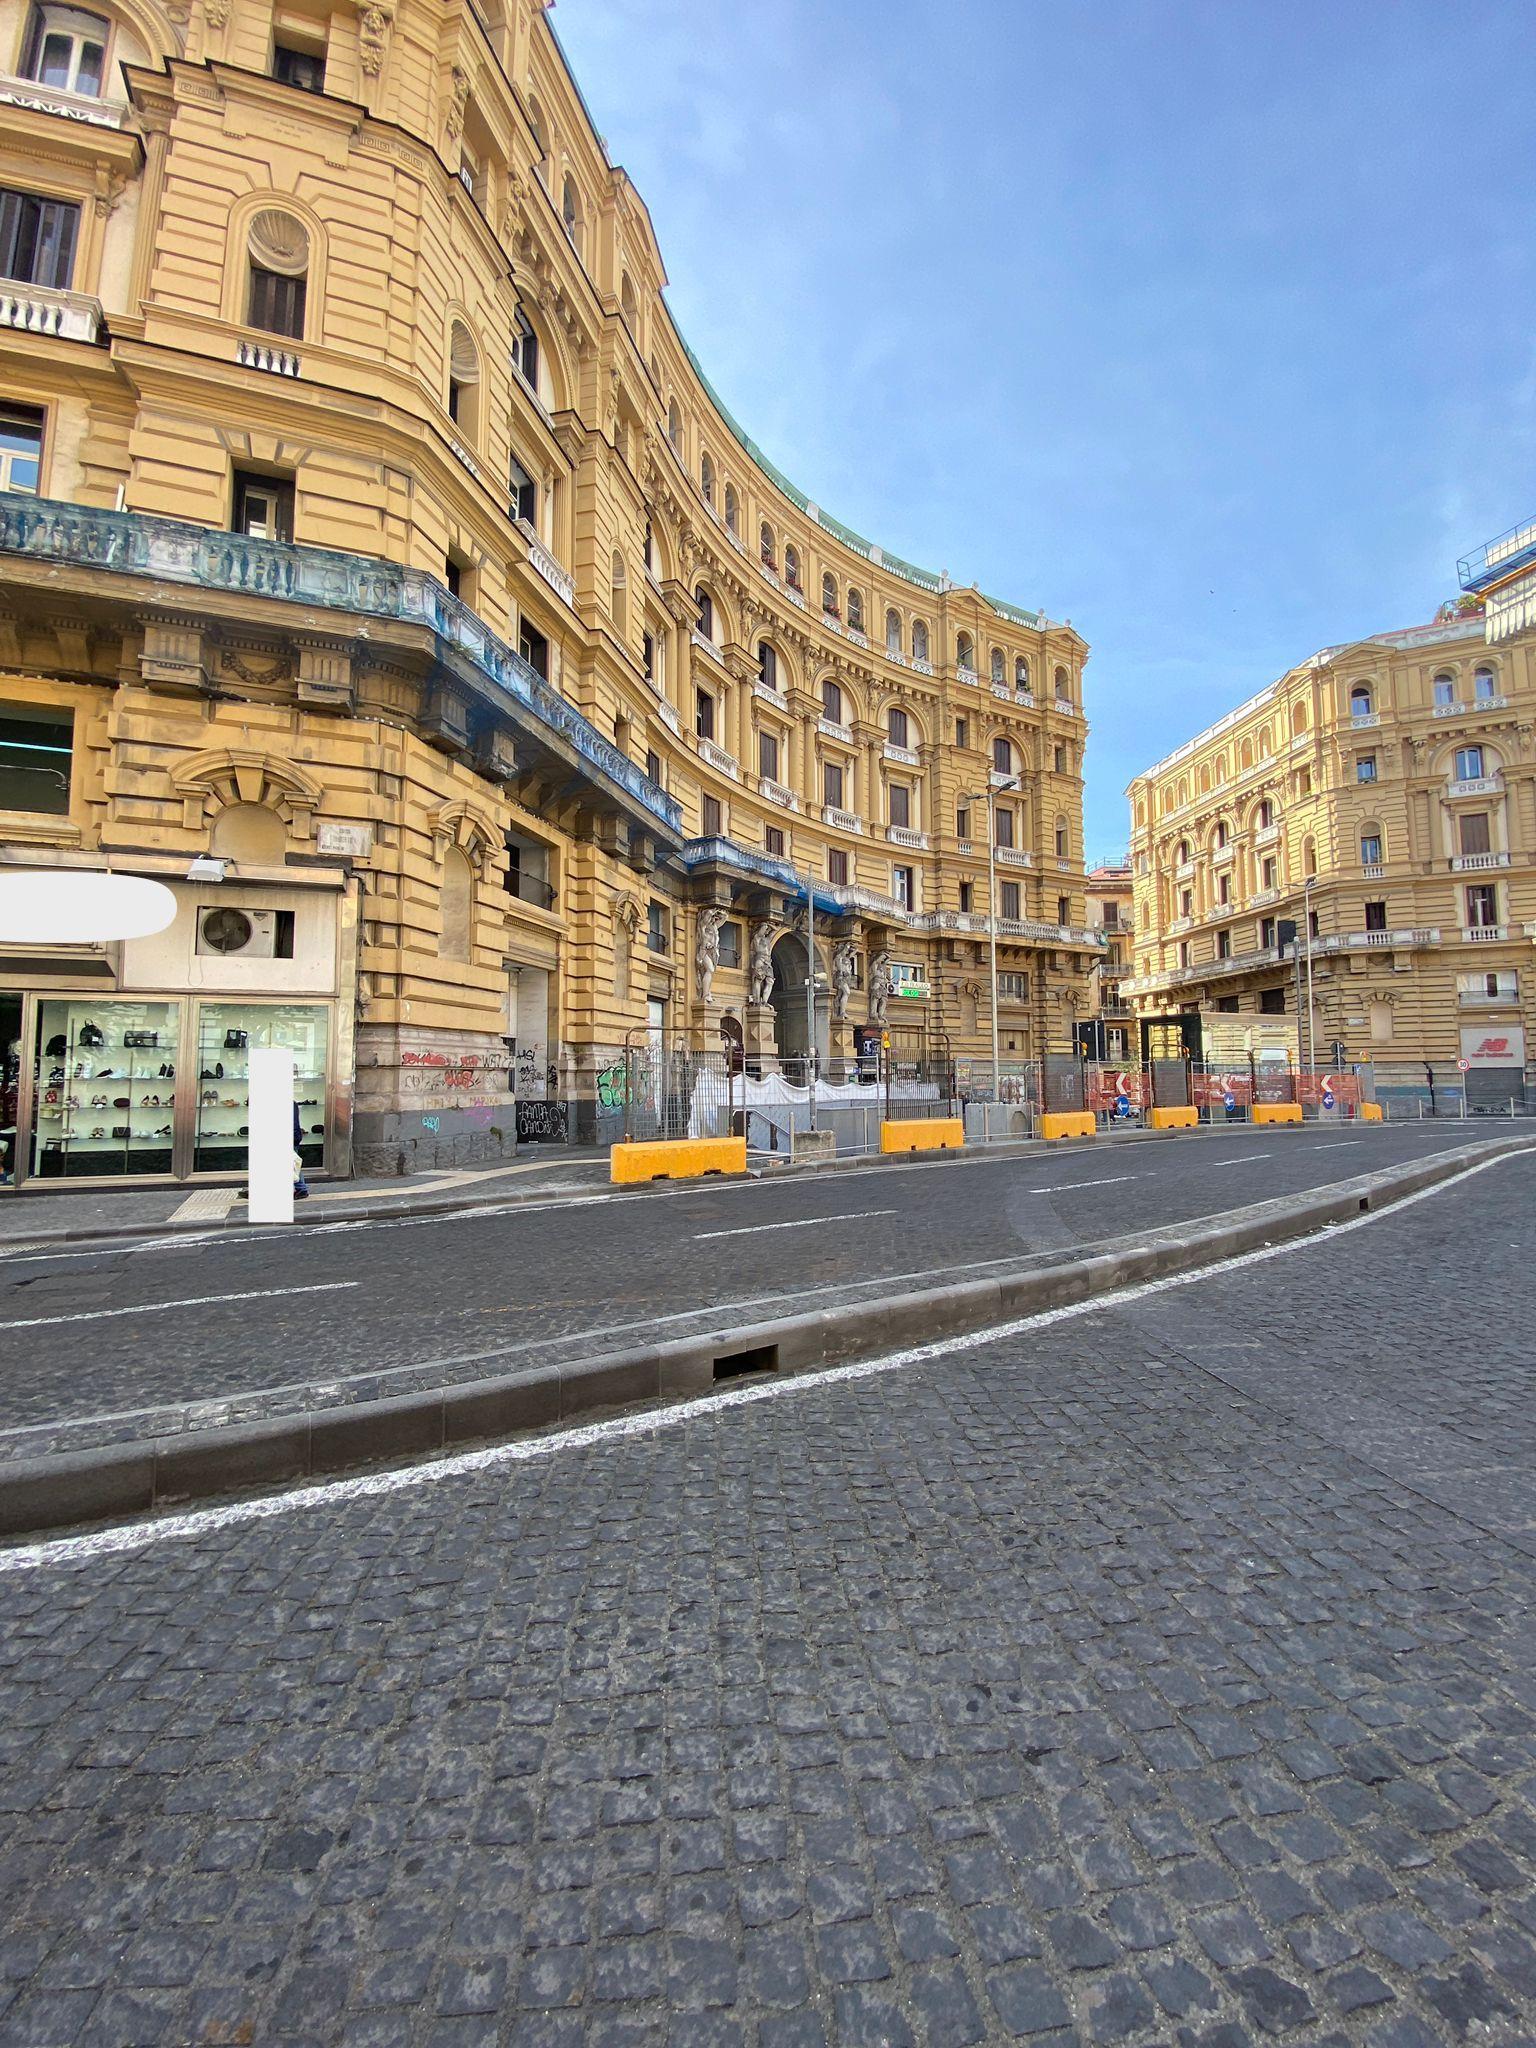 Napoli Corso Umberto – Piazza Nicola Amore Tabaccheria cedesi